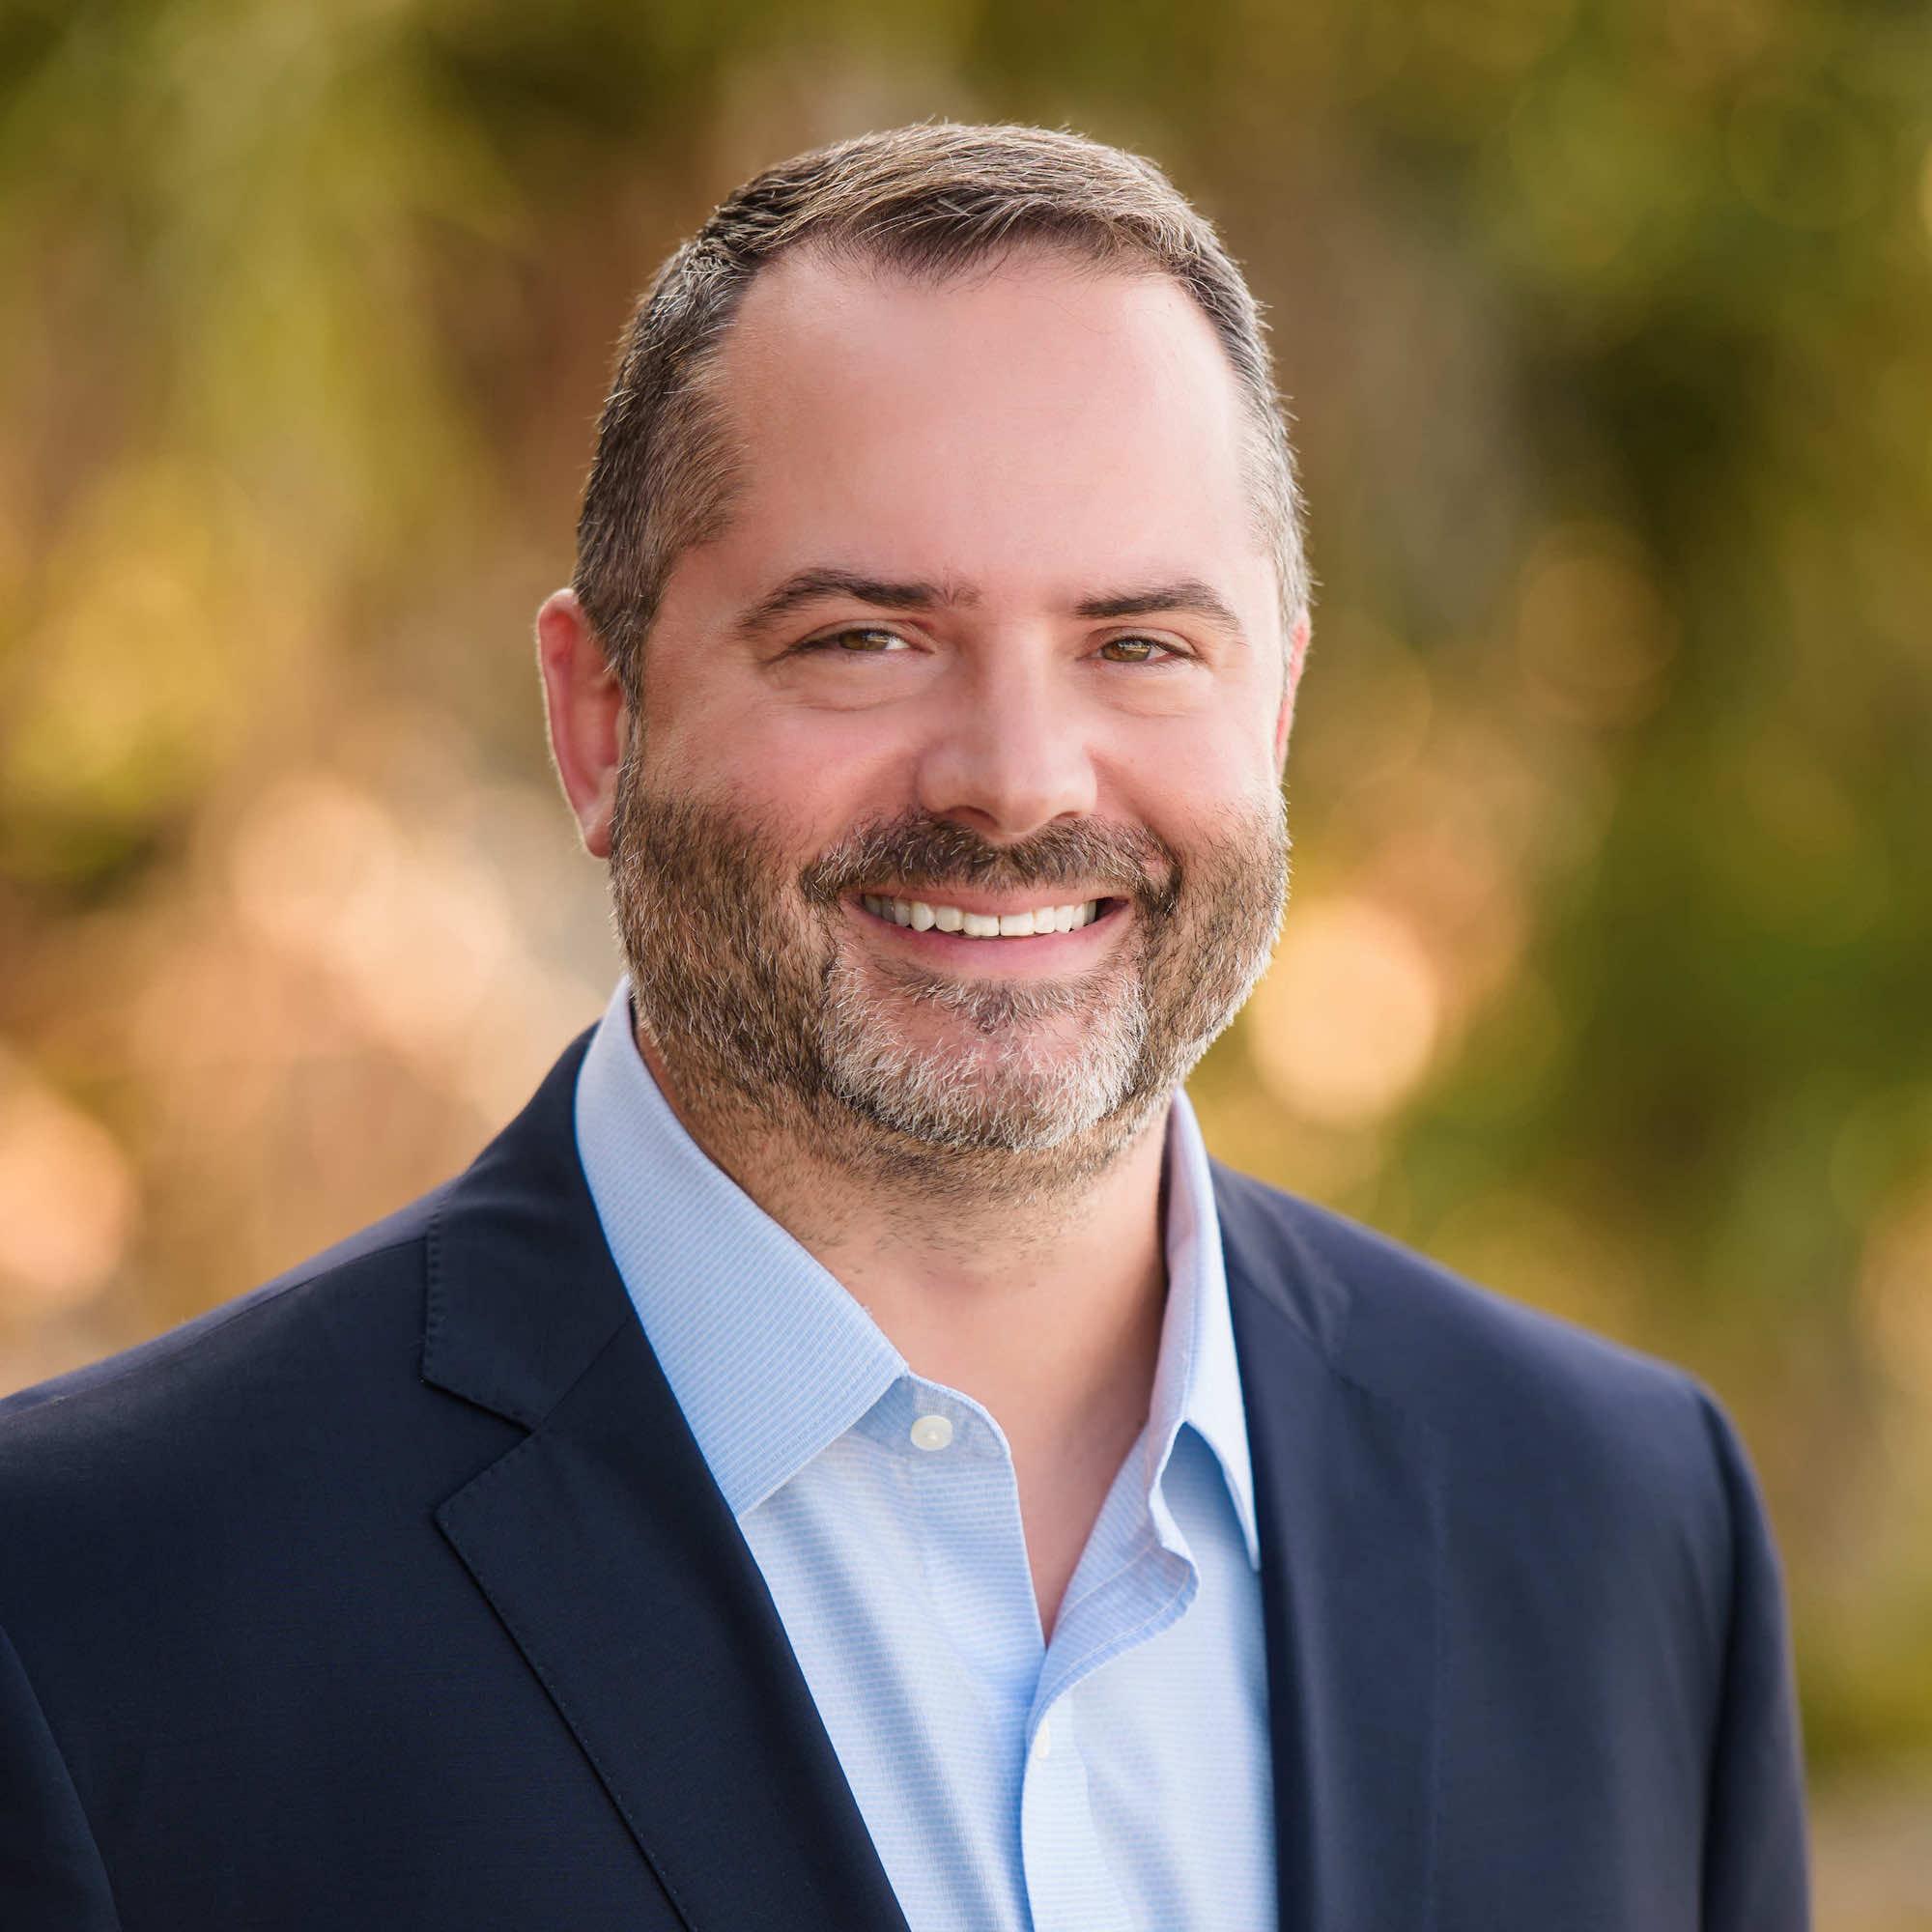 Chris Shoup, CFP® headshot Apollo Beach, FL SouthShore Financial Planning, LLC